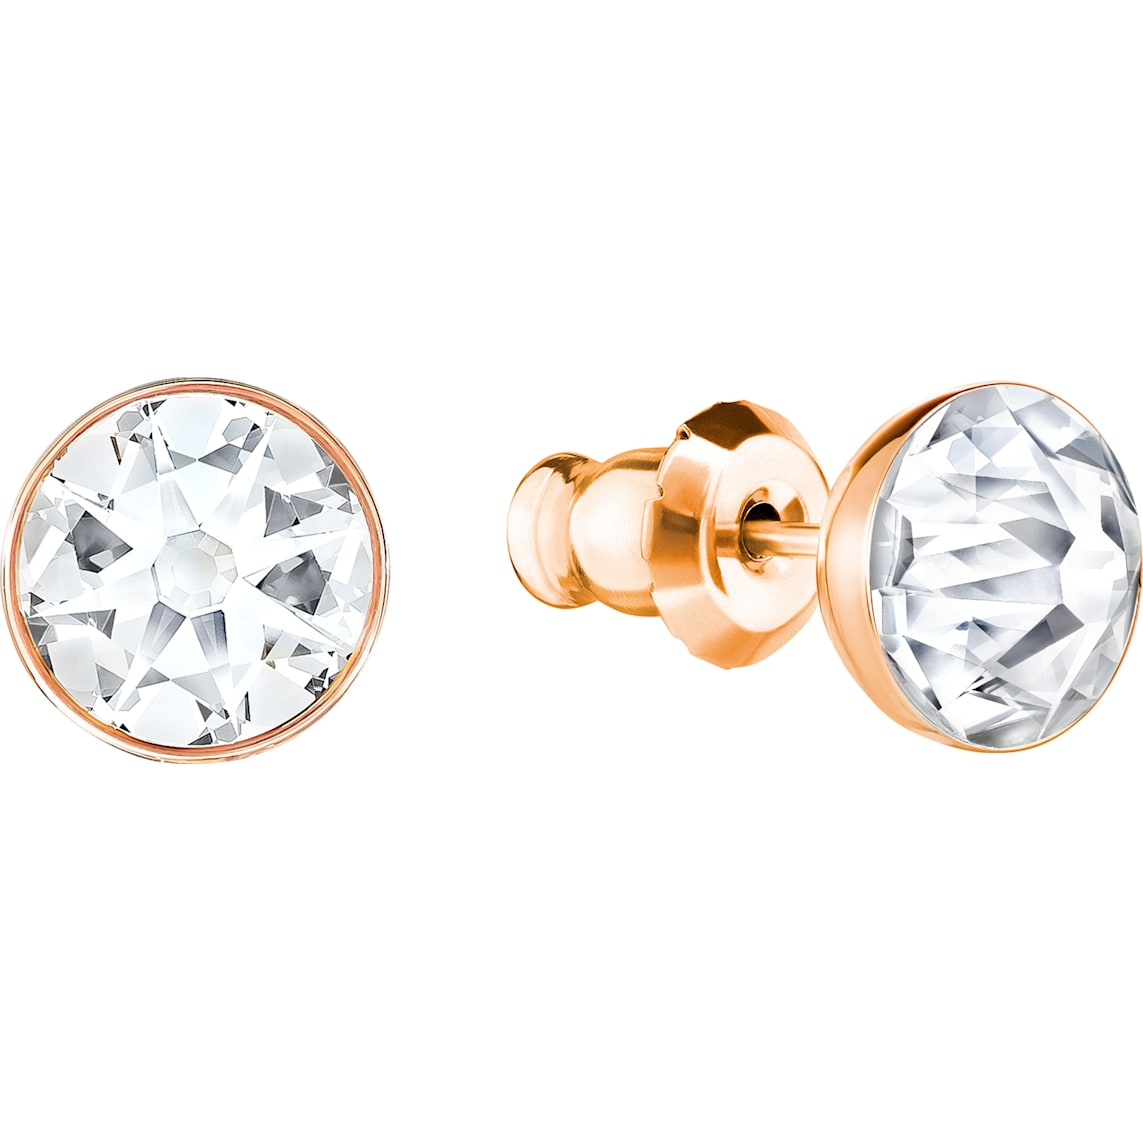 Forward Pierced Earring Jackets, White, Rose Gold Plating